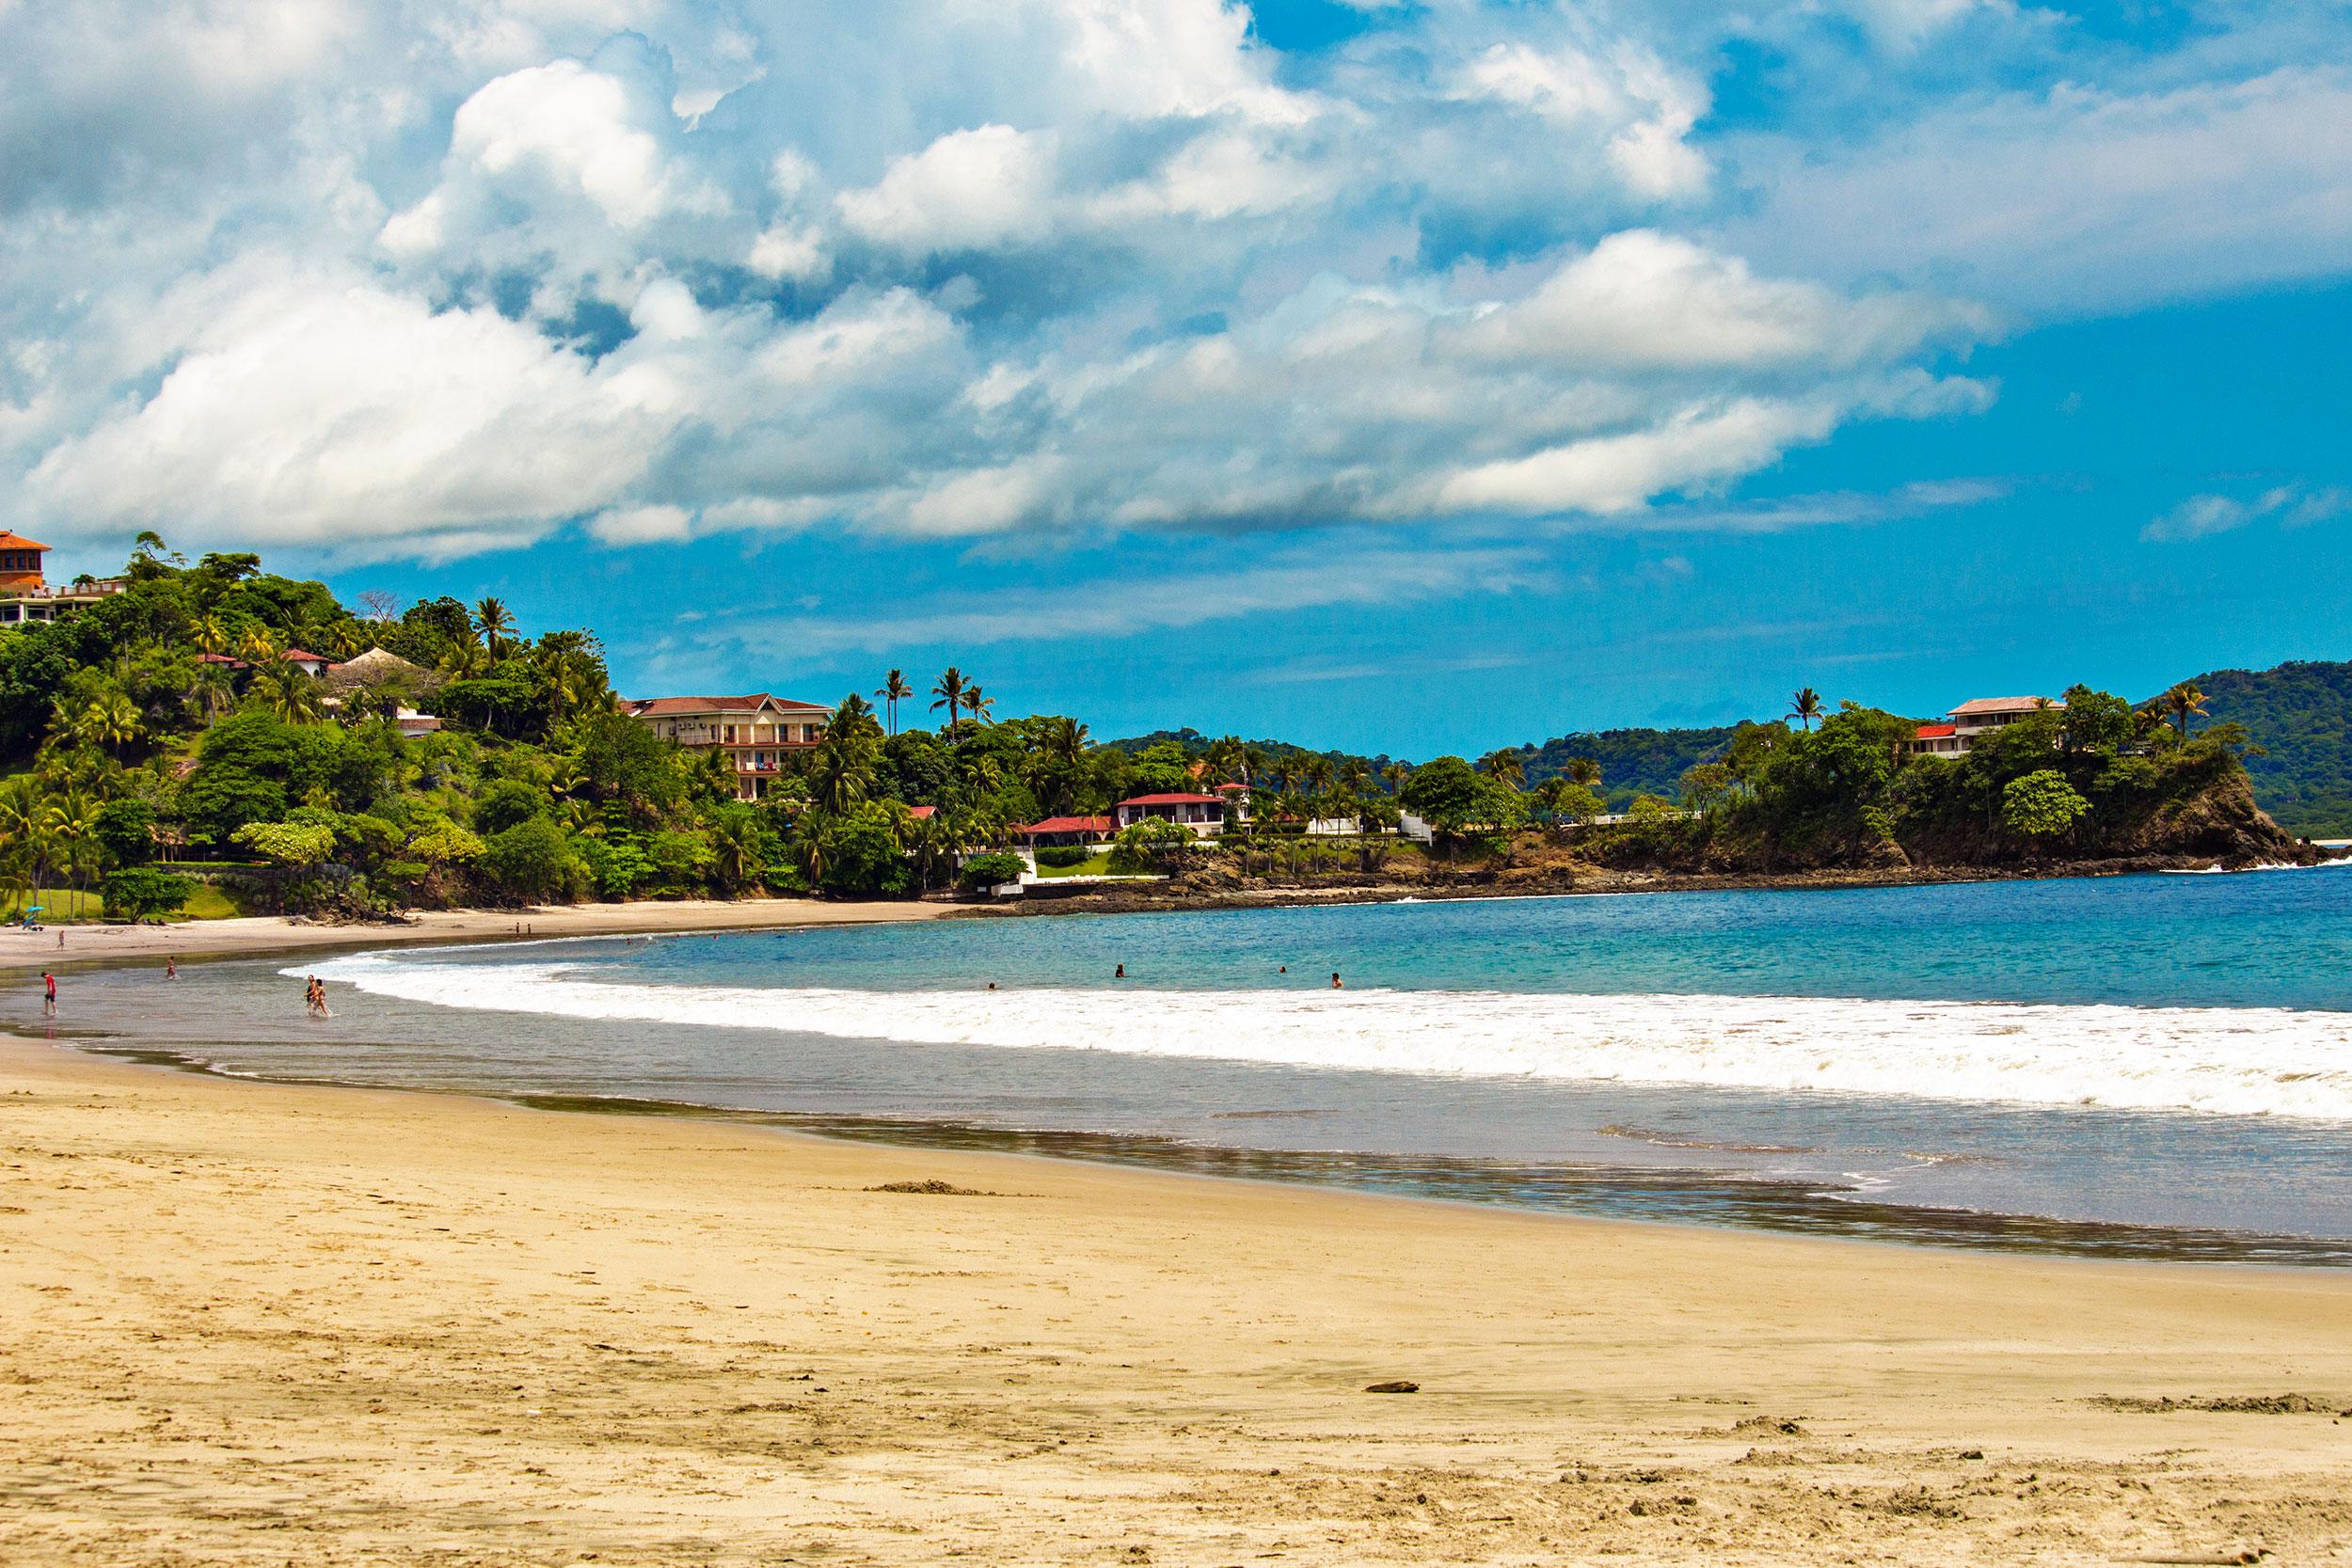 Playa-Flamingo-2.jpg